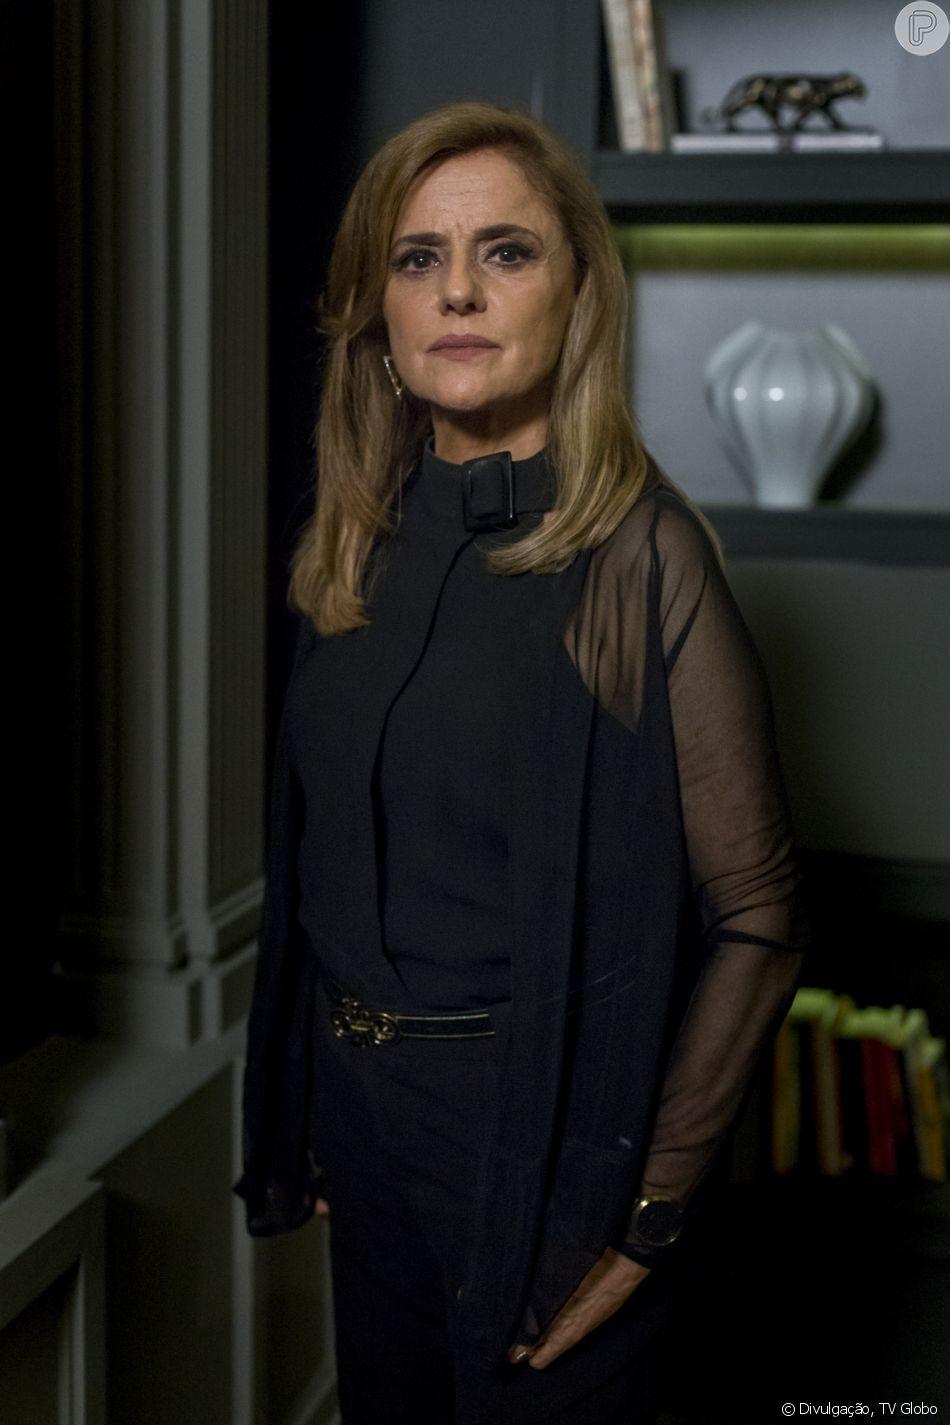 Sophia (Marieta Severo) morre ao cair de penhasco atormentada por espíritos no último capítulo da novela 'O Outro Lado do Paraíso'